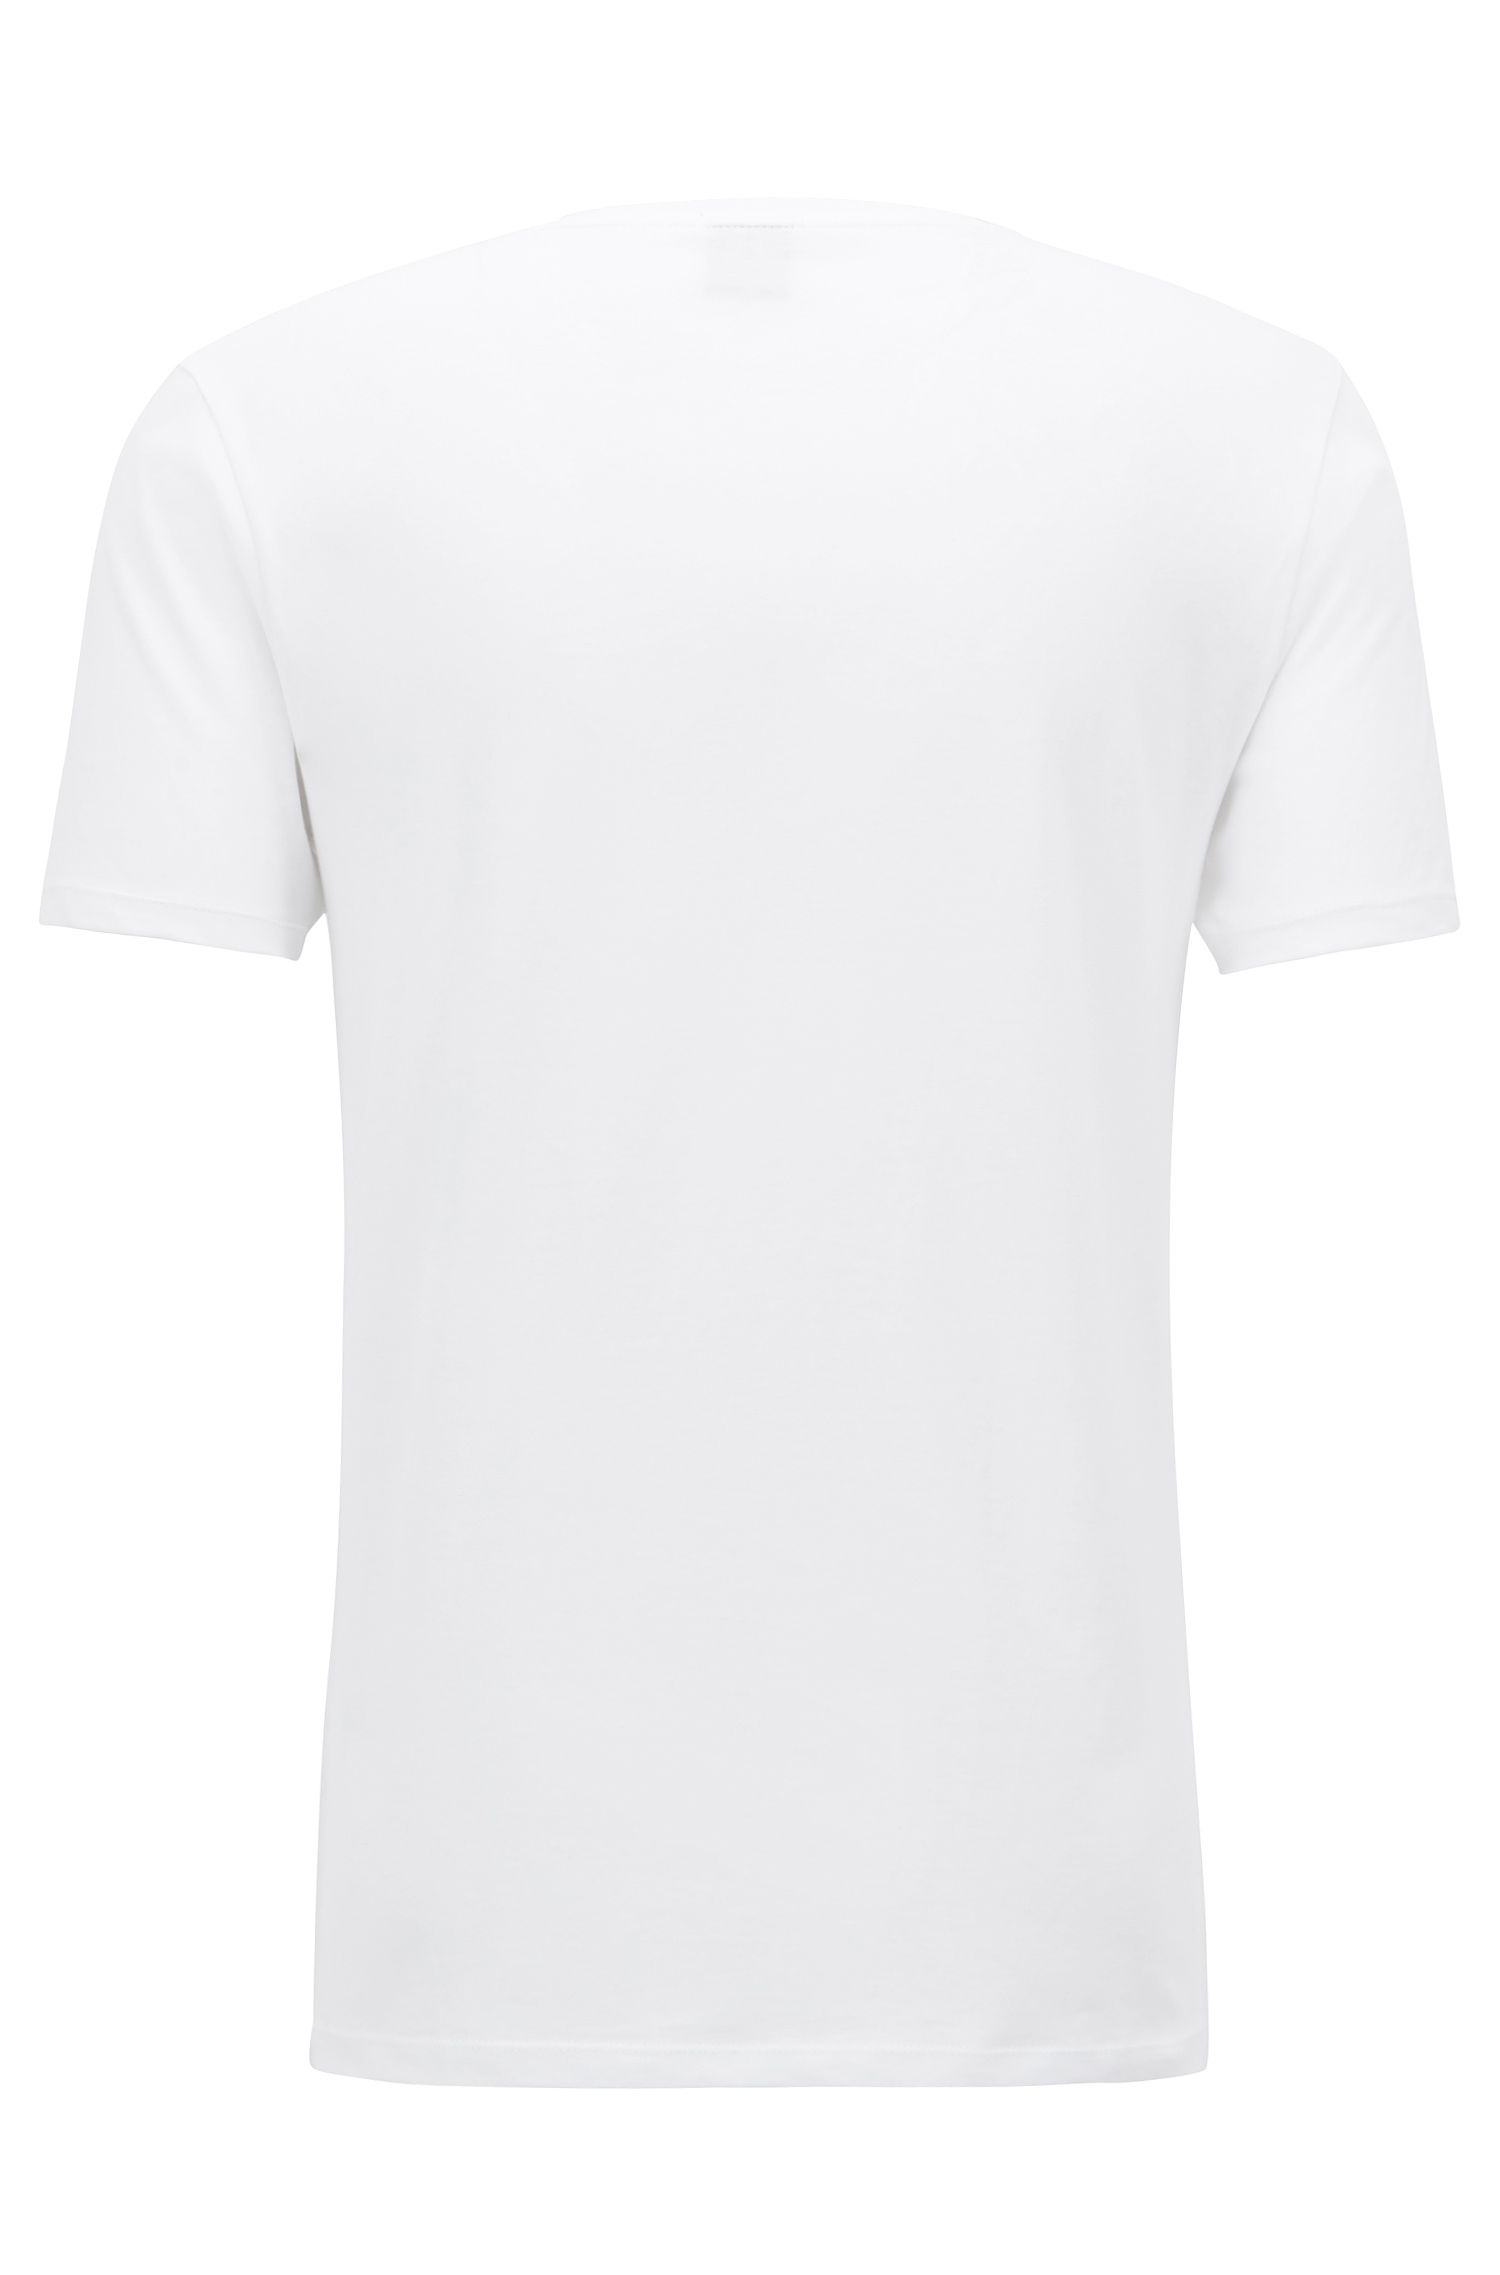 Unisex cotton T-shirt with Michael Jackson dance pose print, White